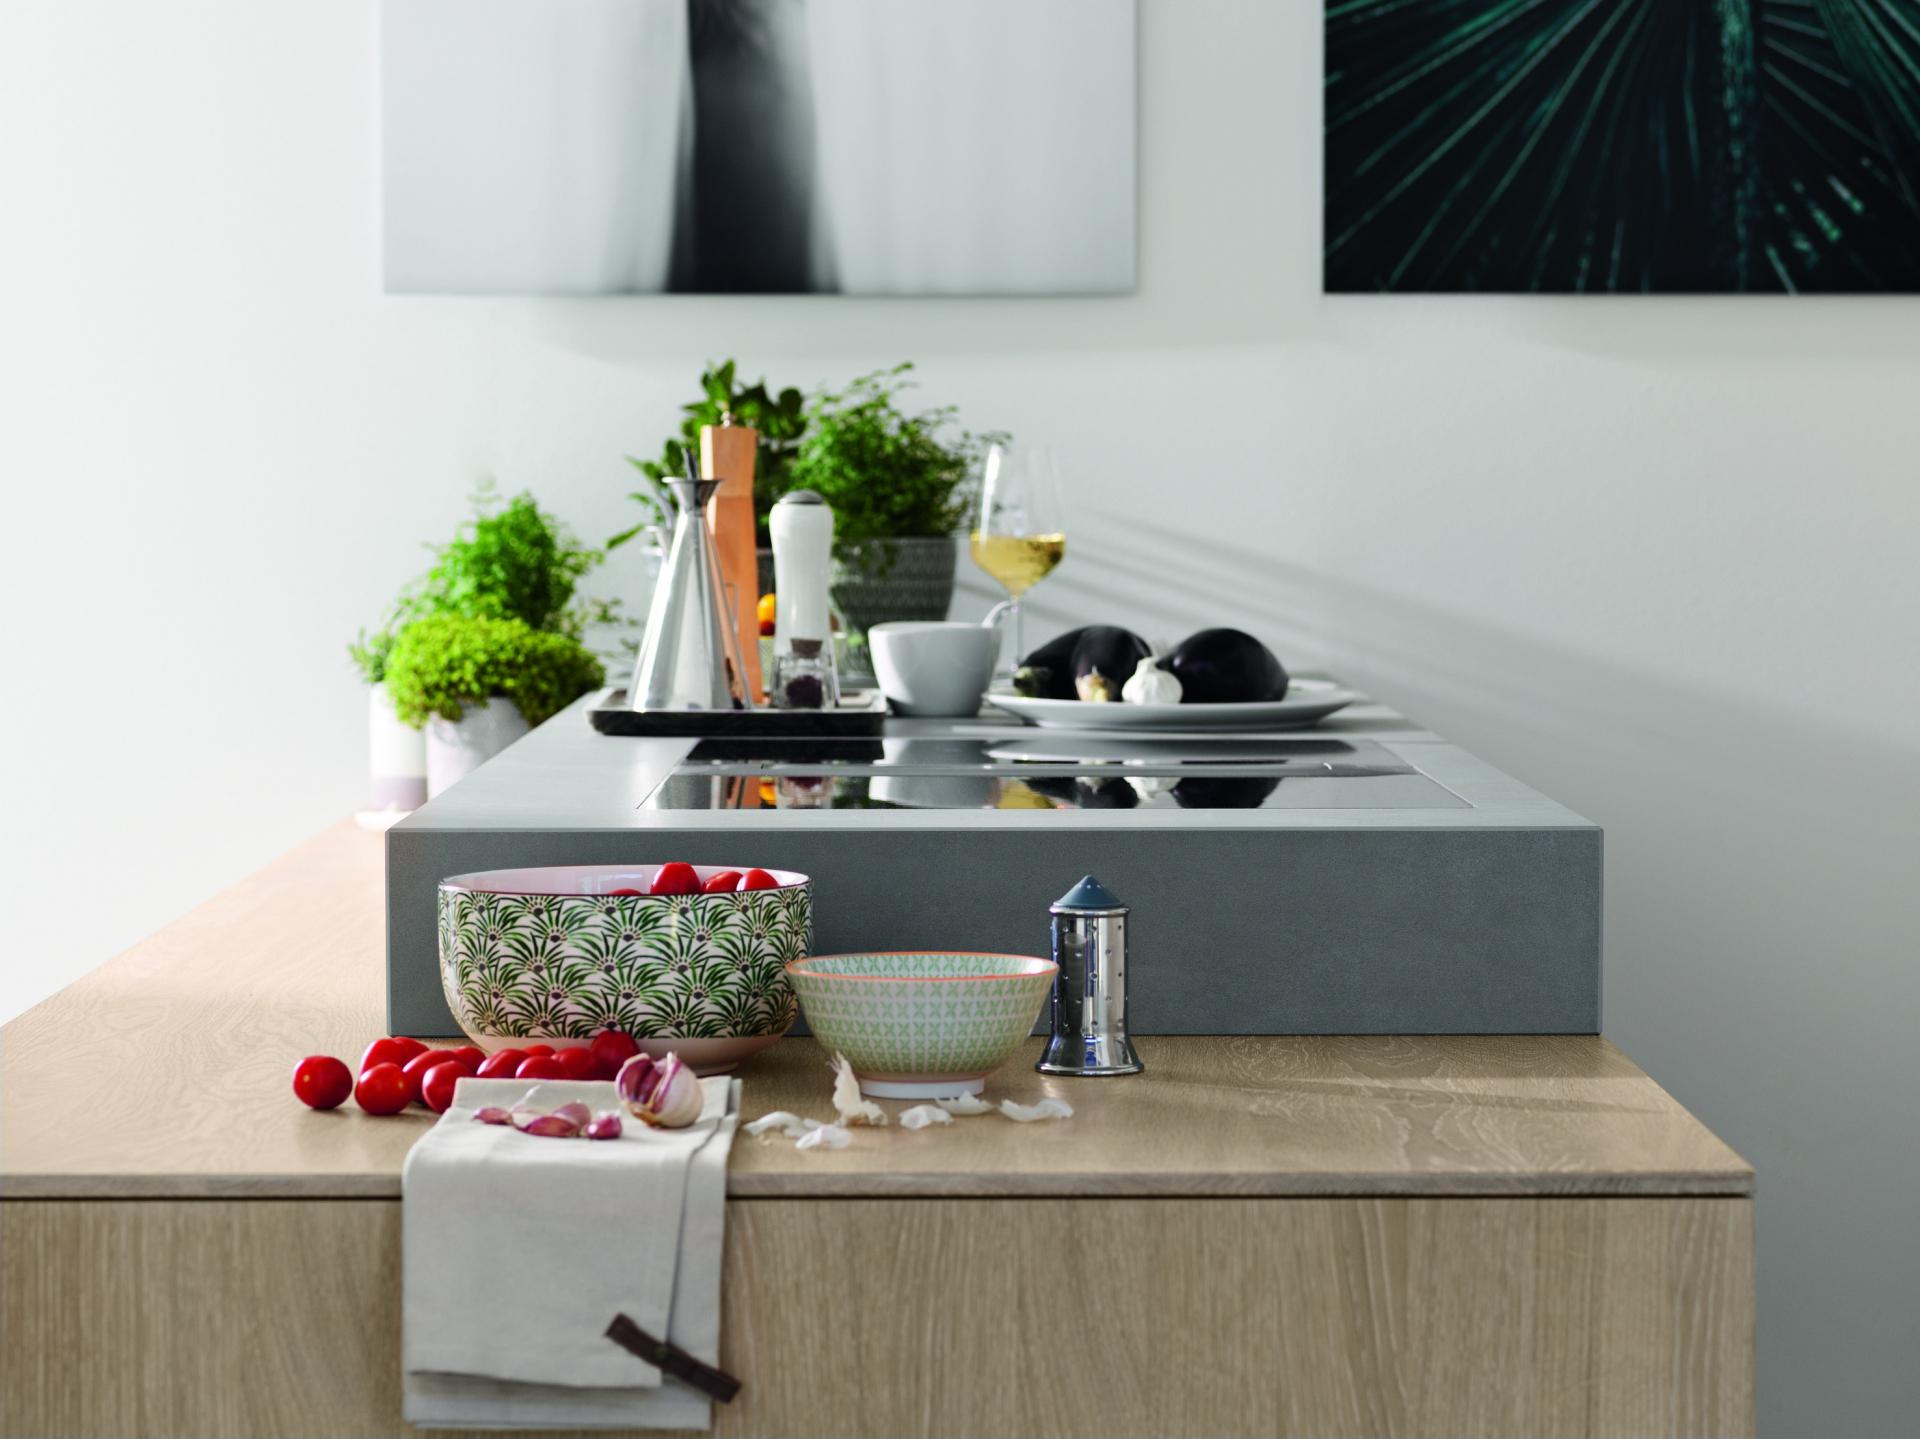 Küchenplanung Herdplatte